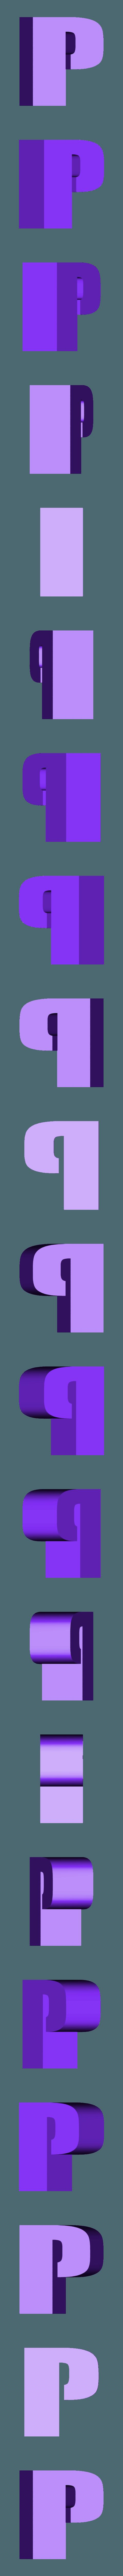 P.STL Download free STL file PhonePad • 3D printable model, doppiozero